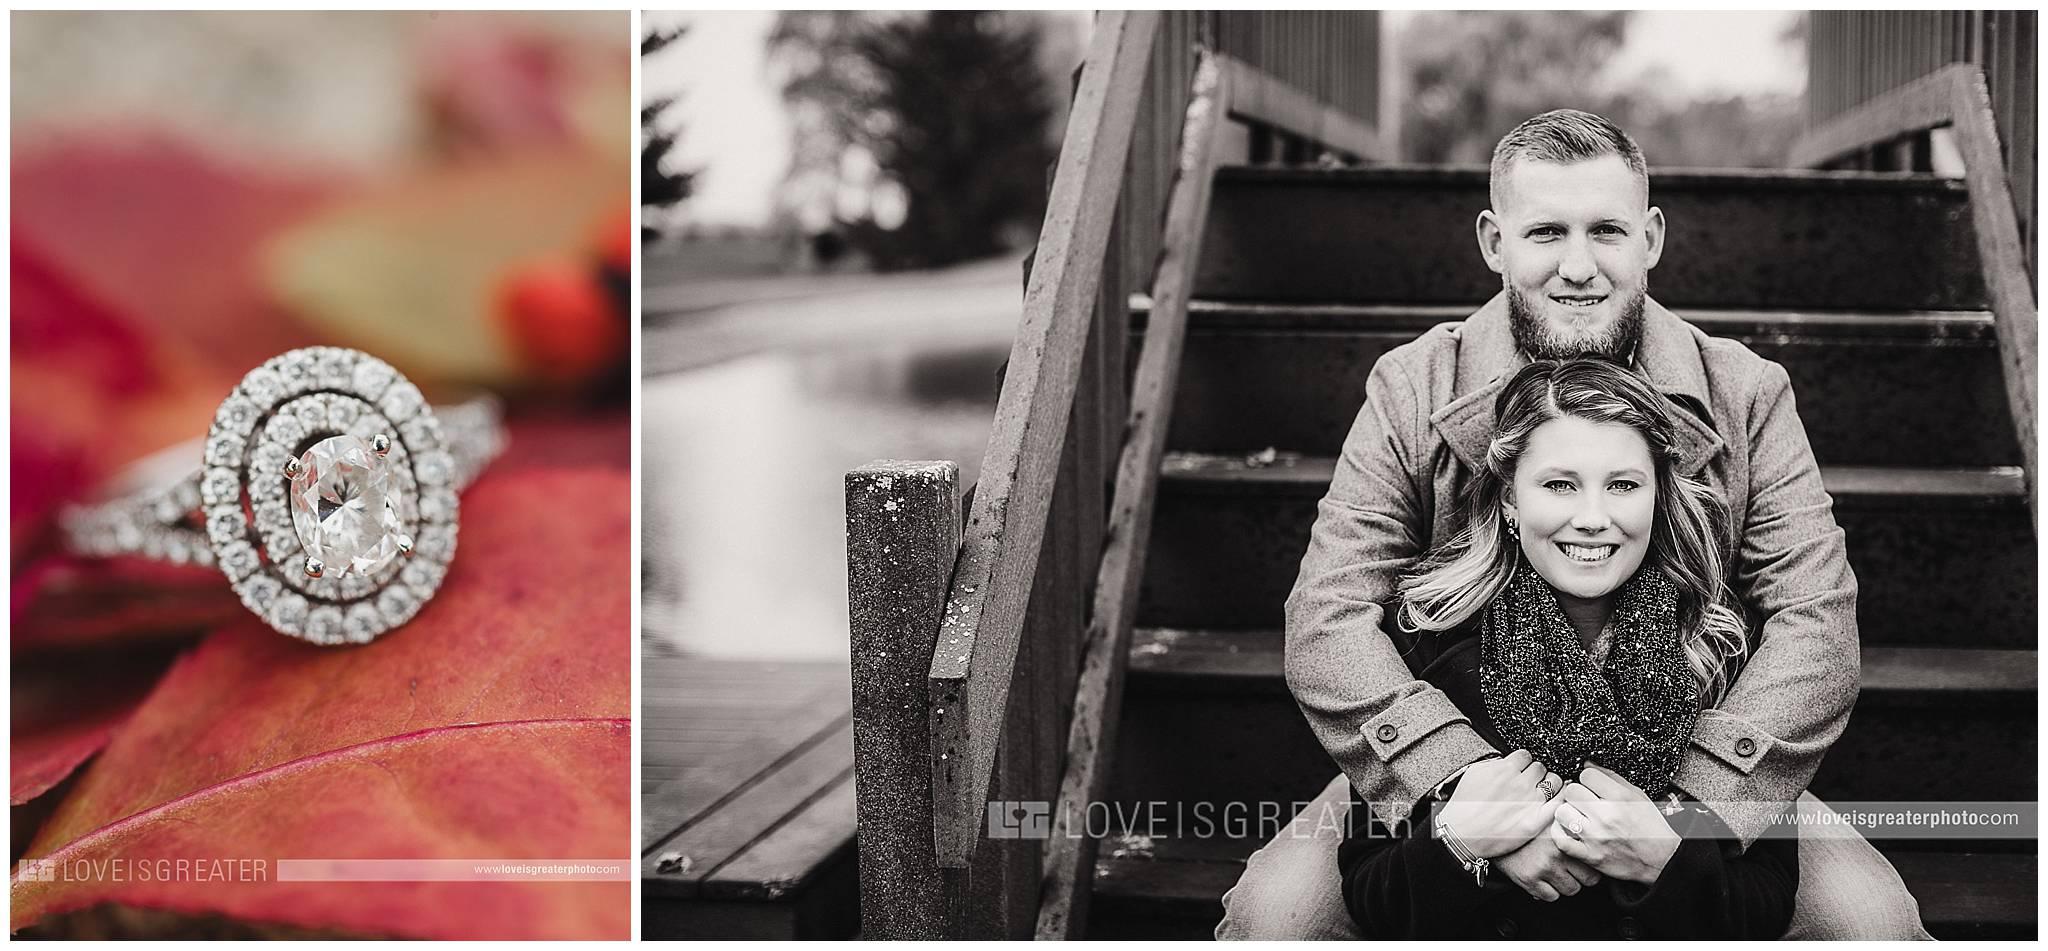 ohio engagement photography, ohio metro park photography, ohio photographer, ohio photography, Ohio Wedding photographers, ohio wedding photography, toledo engagement photographer, toledo OH wedding photography, toledo ohio photographer